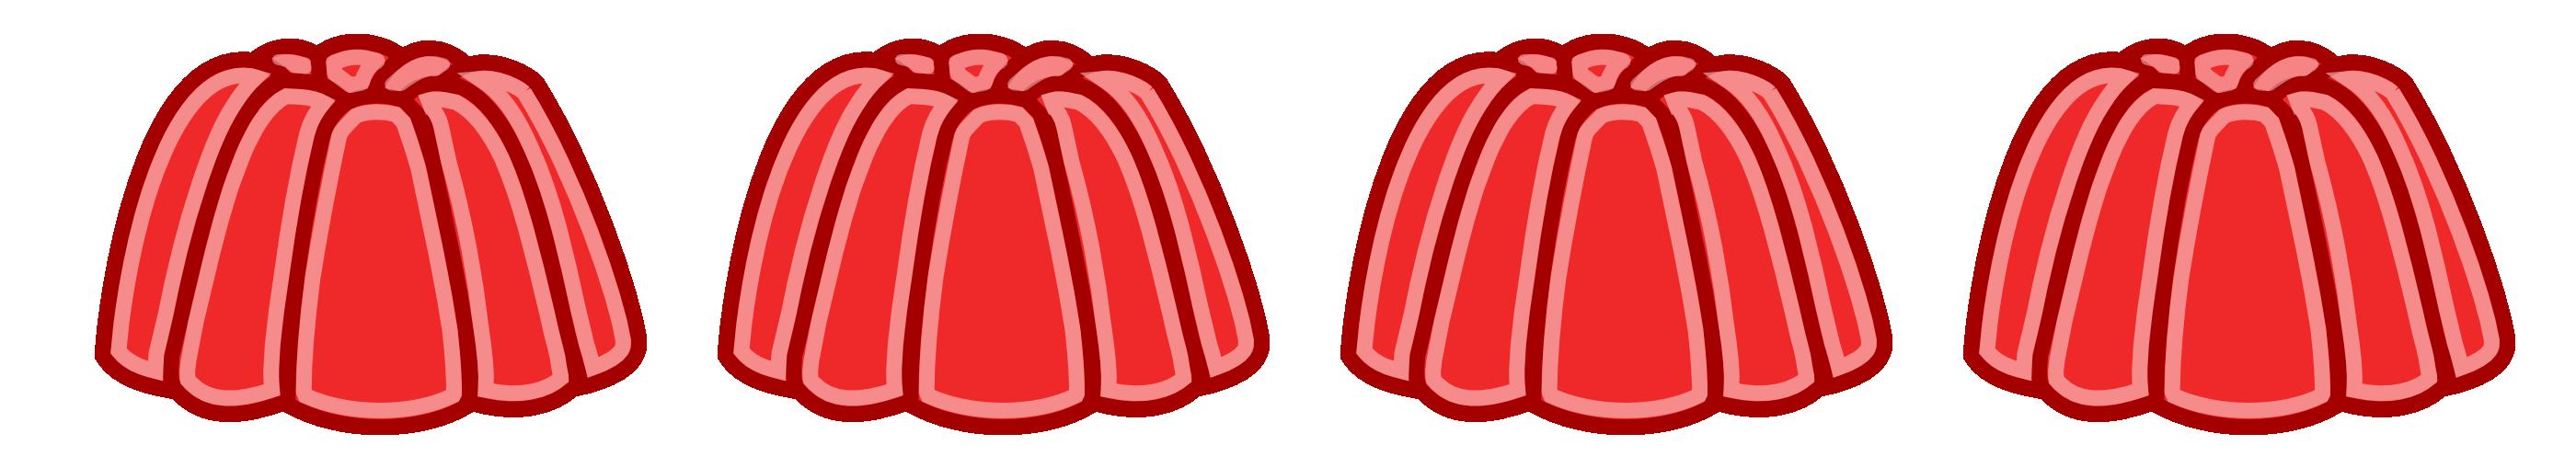 Jelly clipart gelatin. Follow the jell o